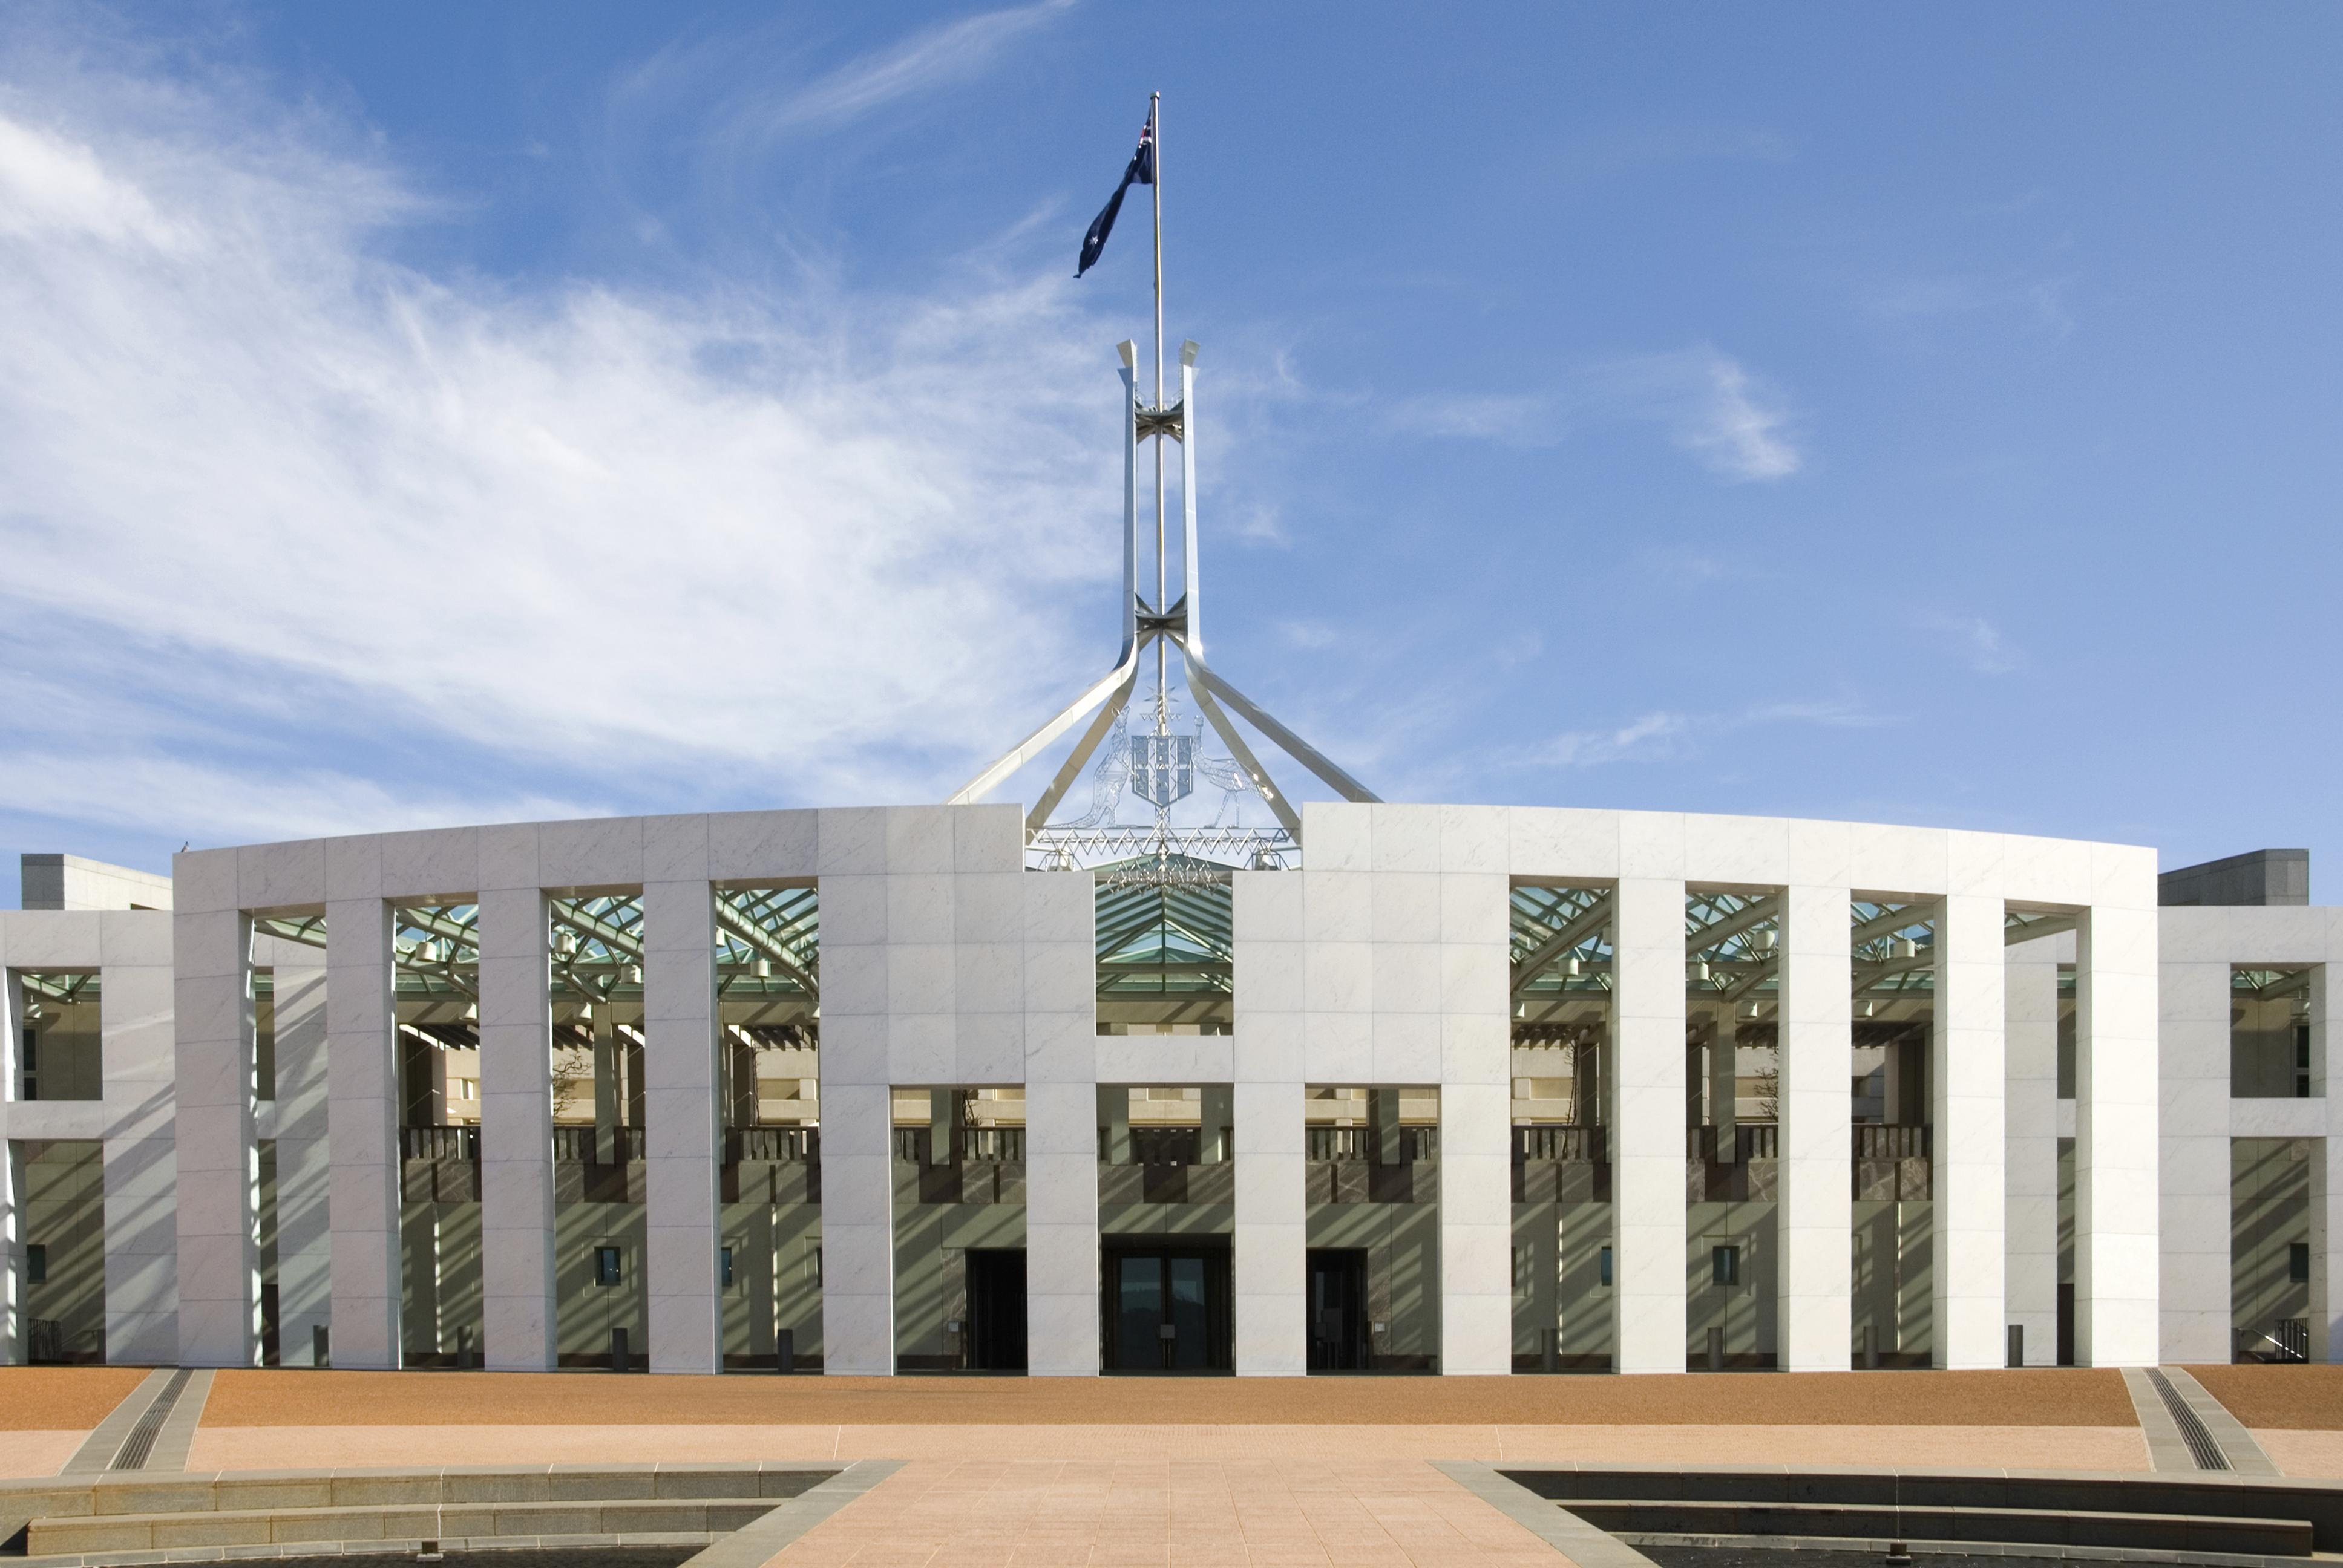 Parliament House, Canberra, Australian Capital Territory